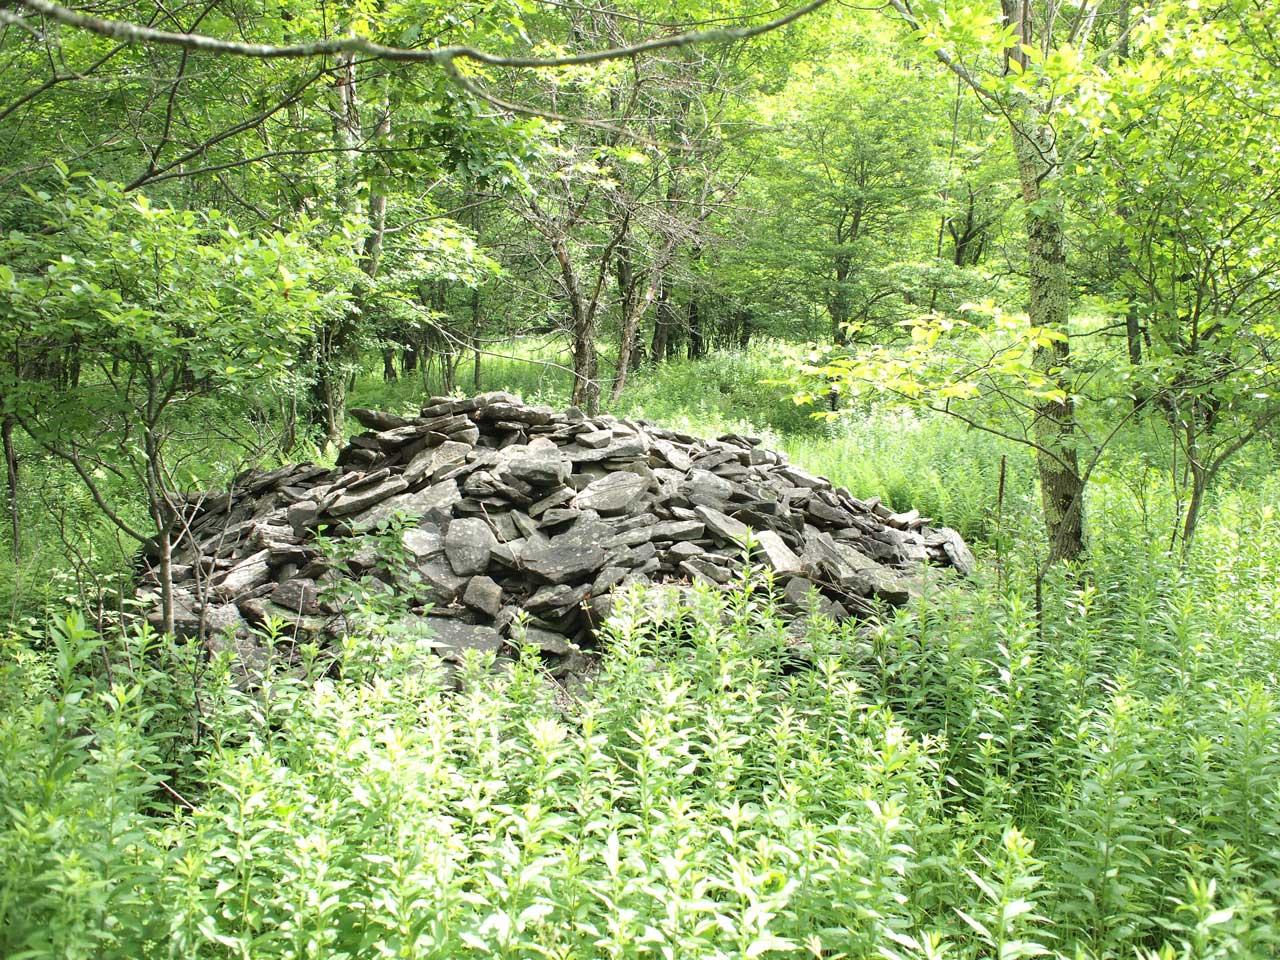 stone-pile.jpg